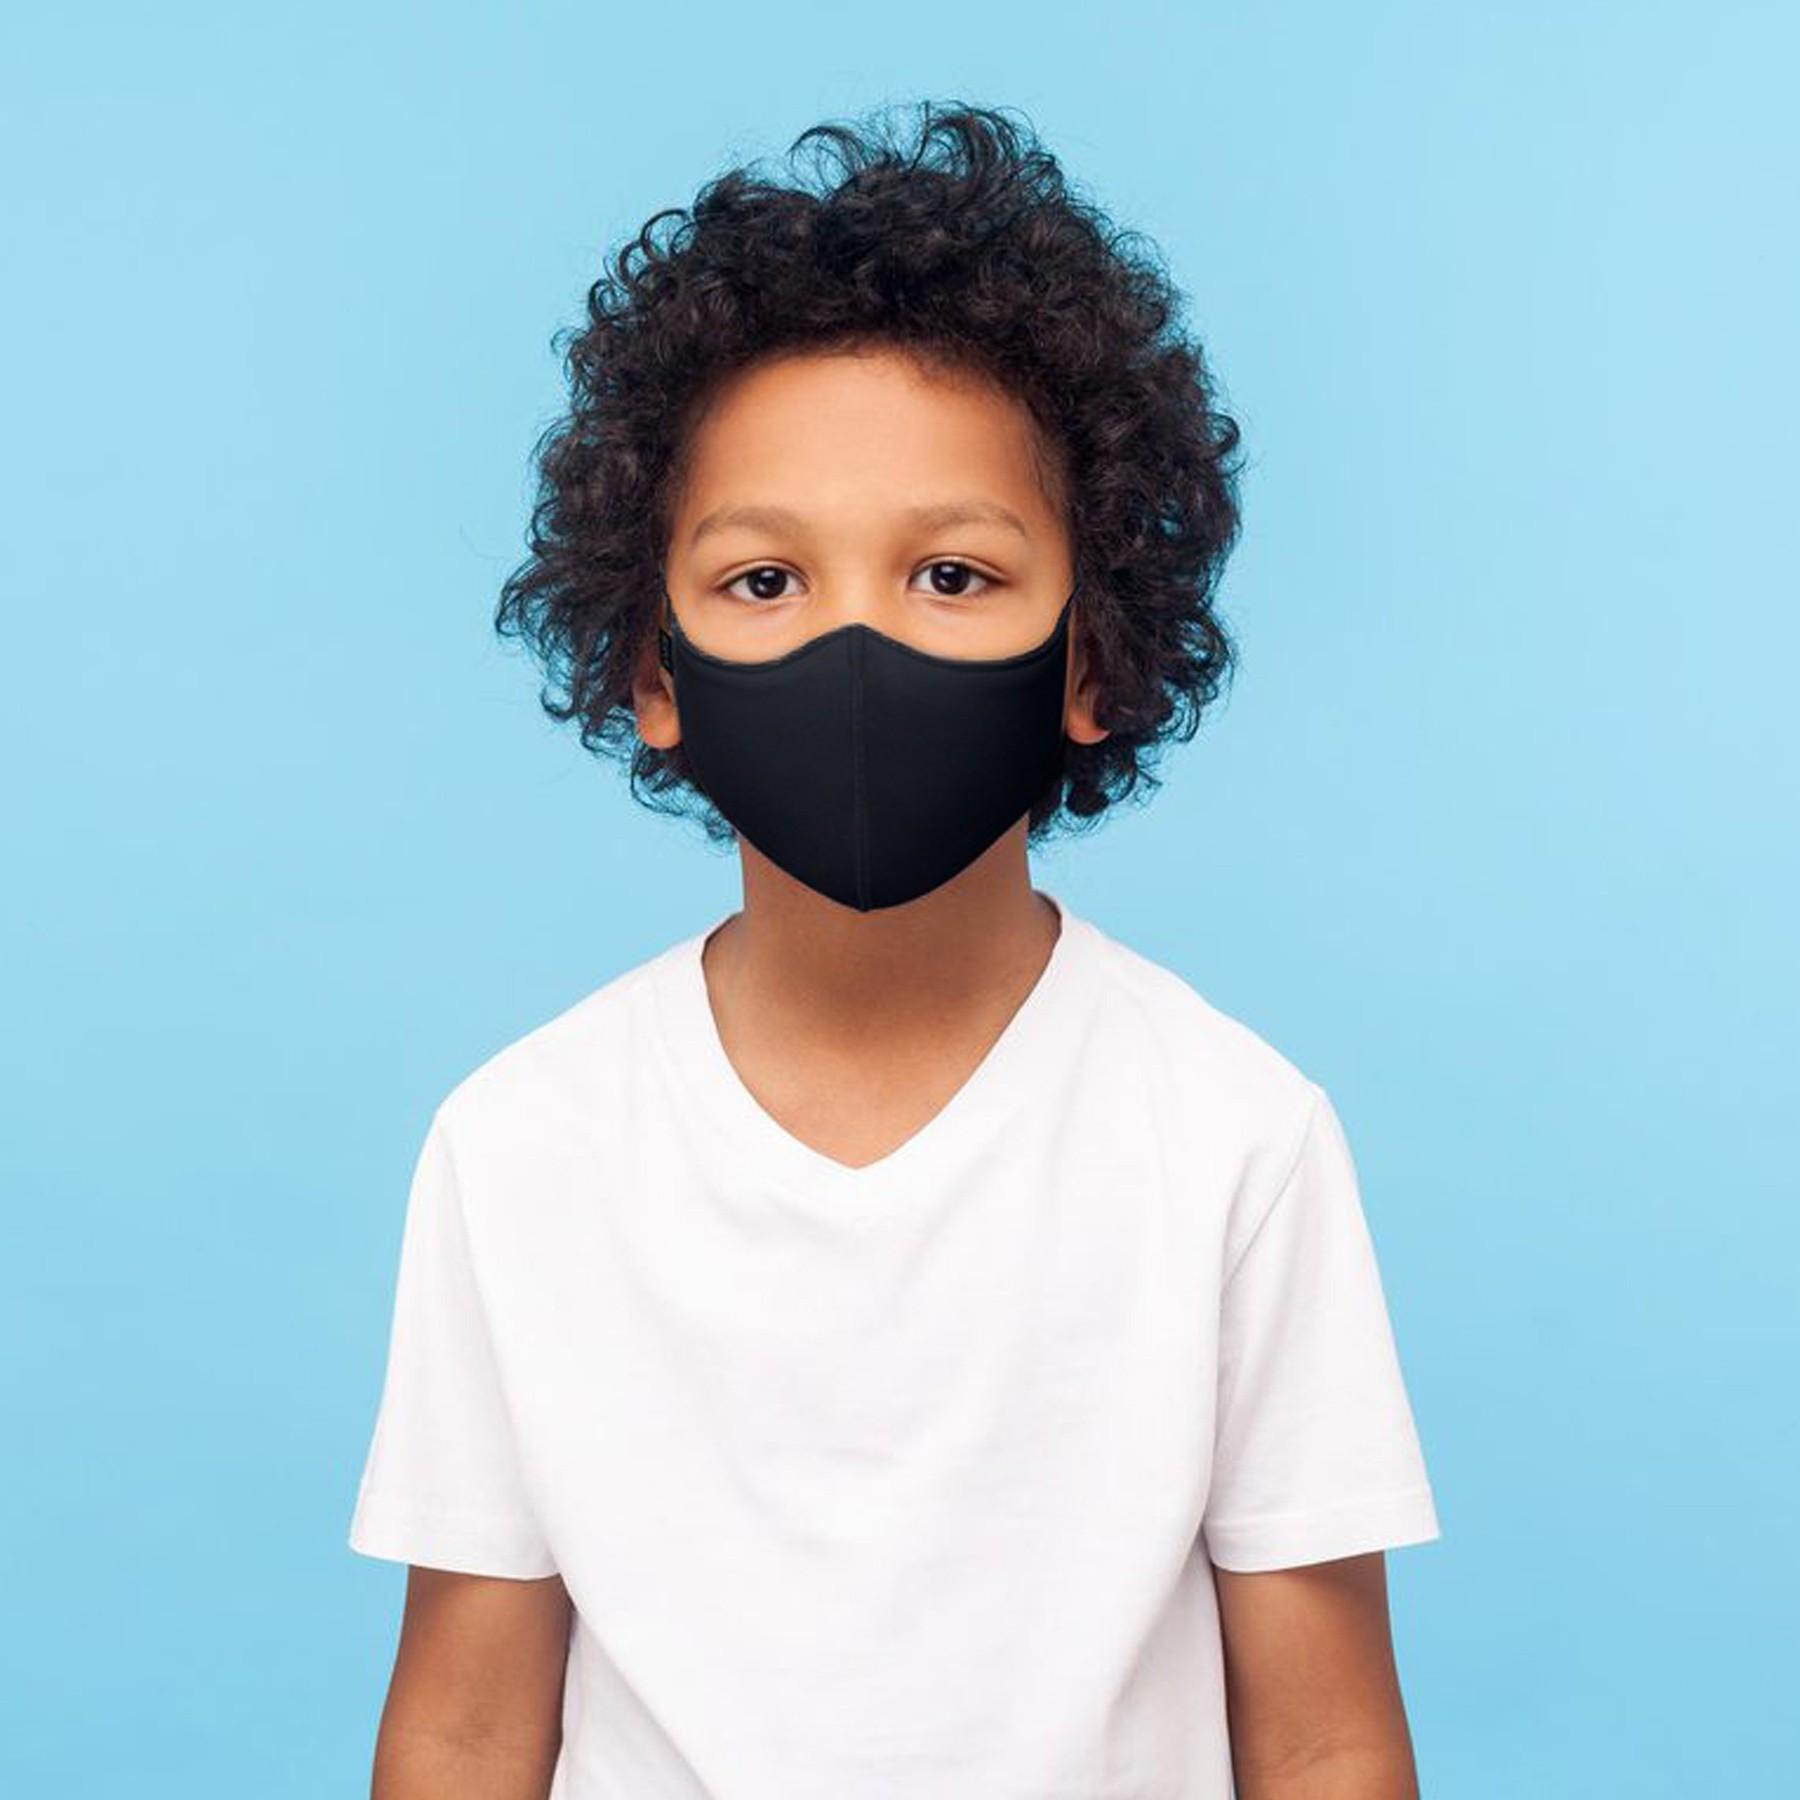 Bloch B-Safe Child's Face Mask Black